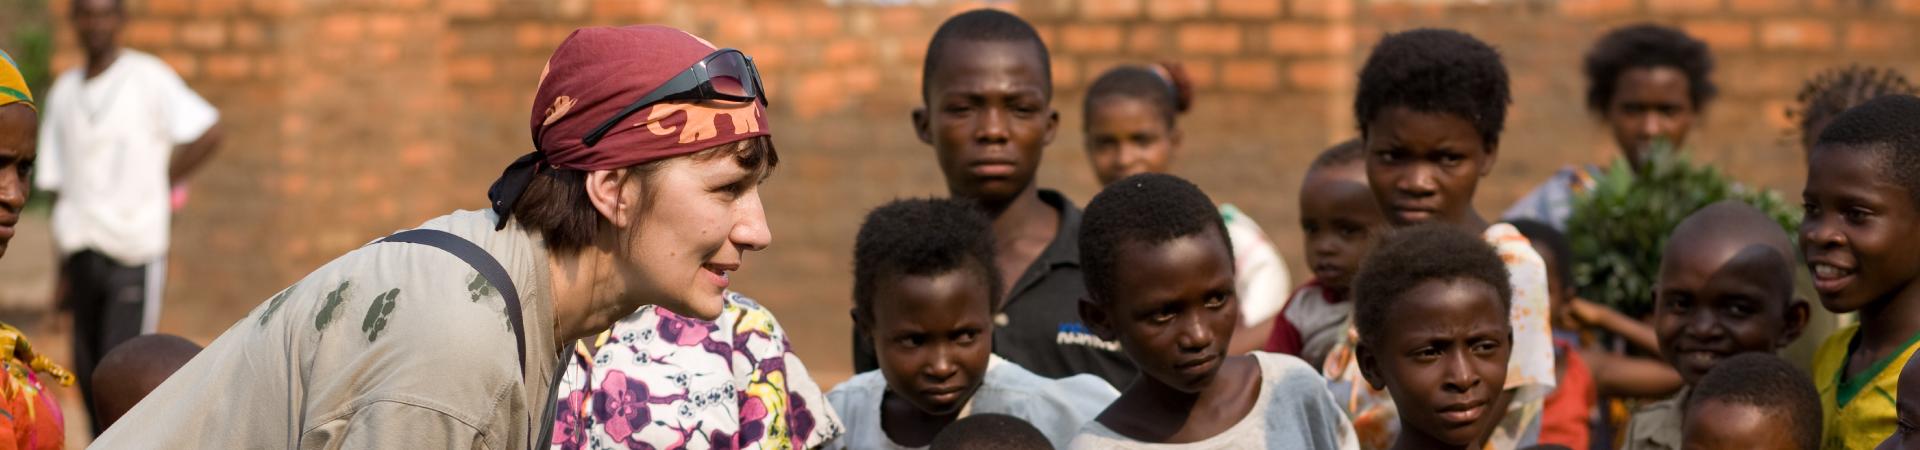 vrijwilliger-mzungu